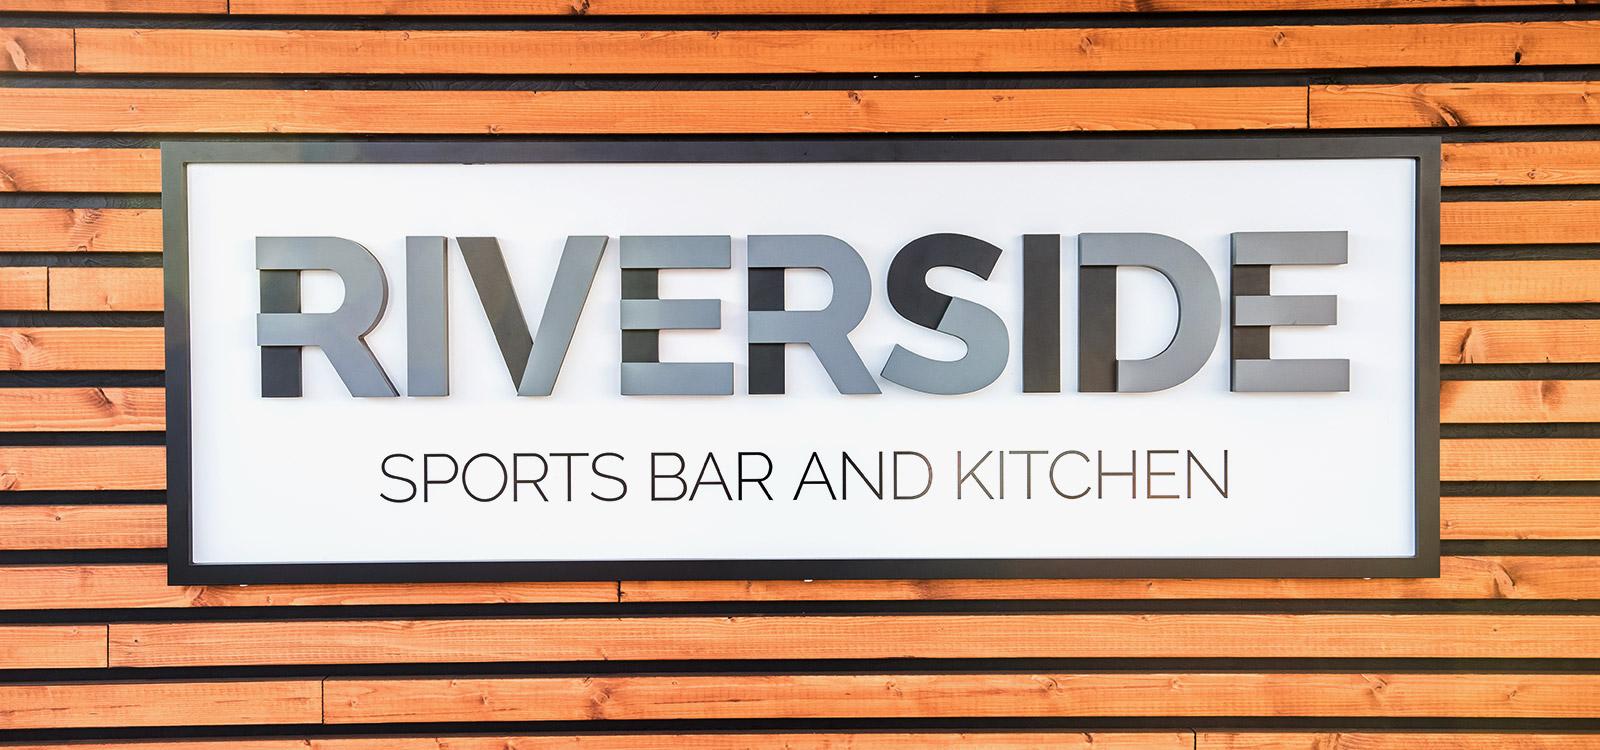 Riverside Logo Signage